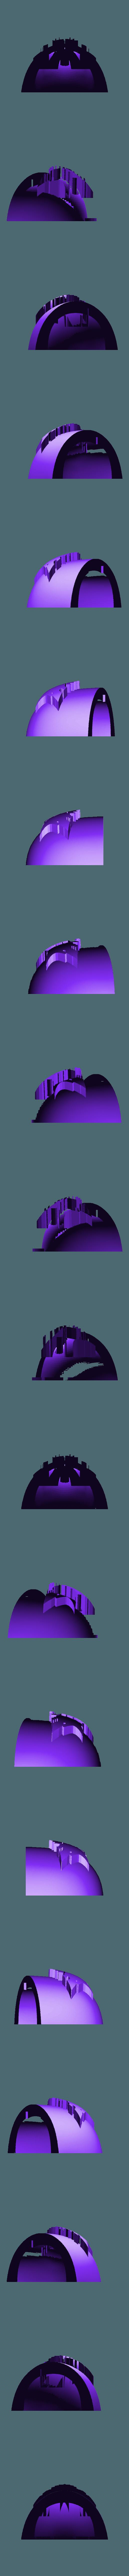 Morkai_Rep_MKV_and_VI_blank_1_Pad.stl Download free STL file Double Wolf head Chapter insignia • 3D printing model, Tatsura